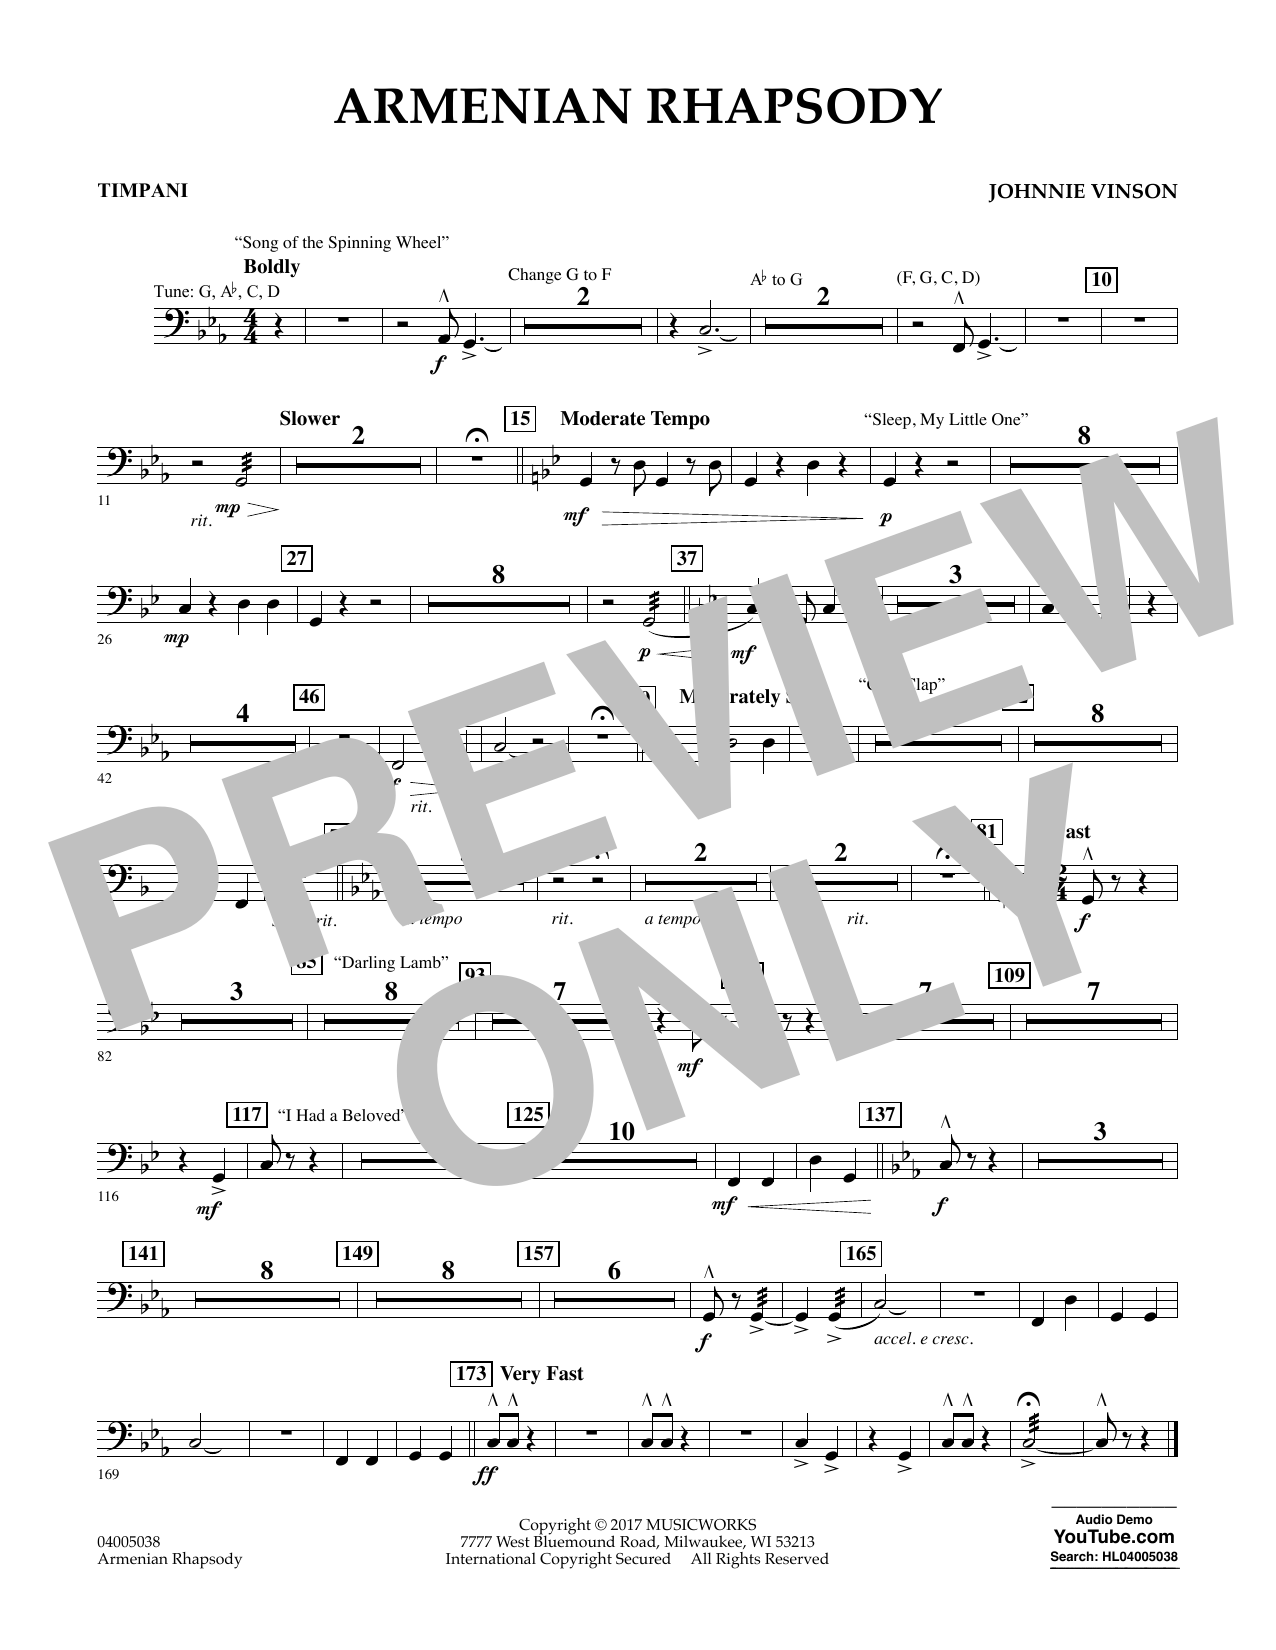 Armenian Rhapsody - Timpani Sheet Music